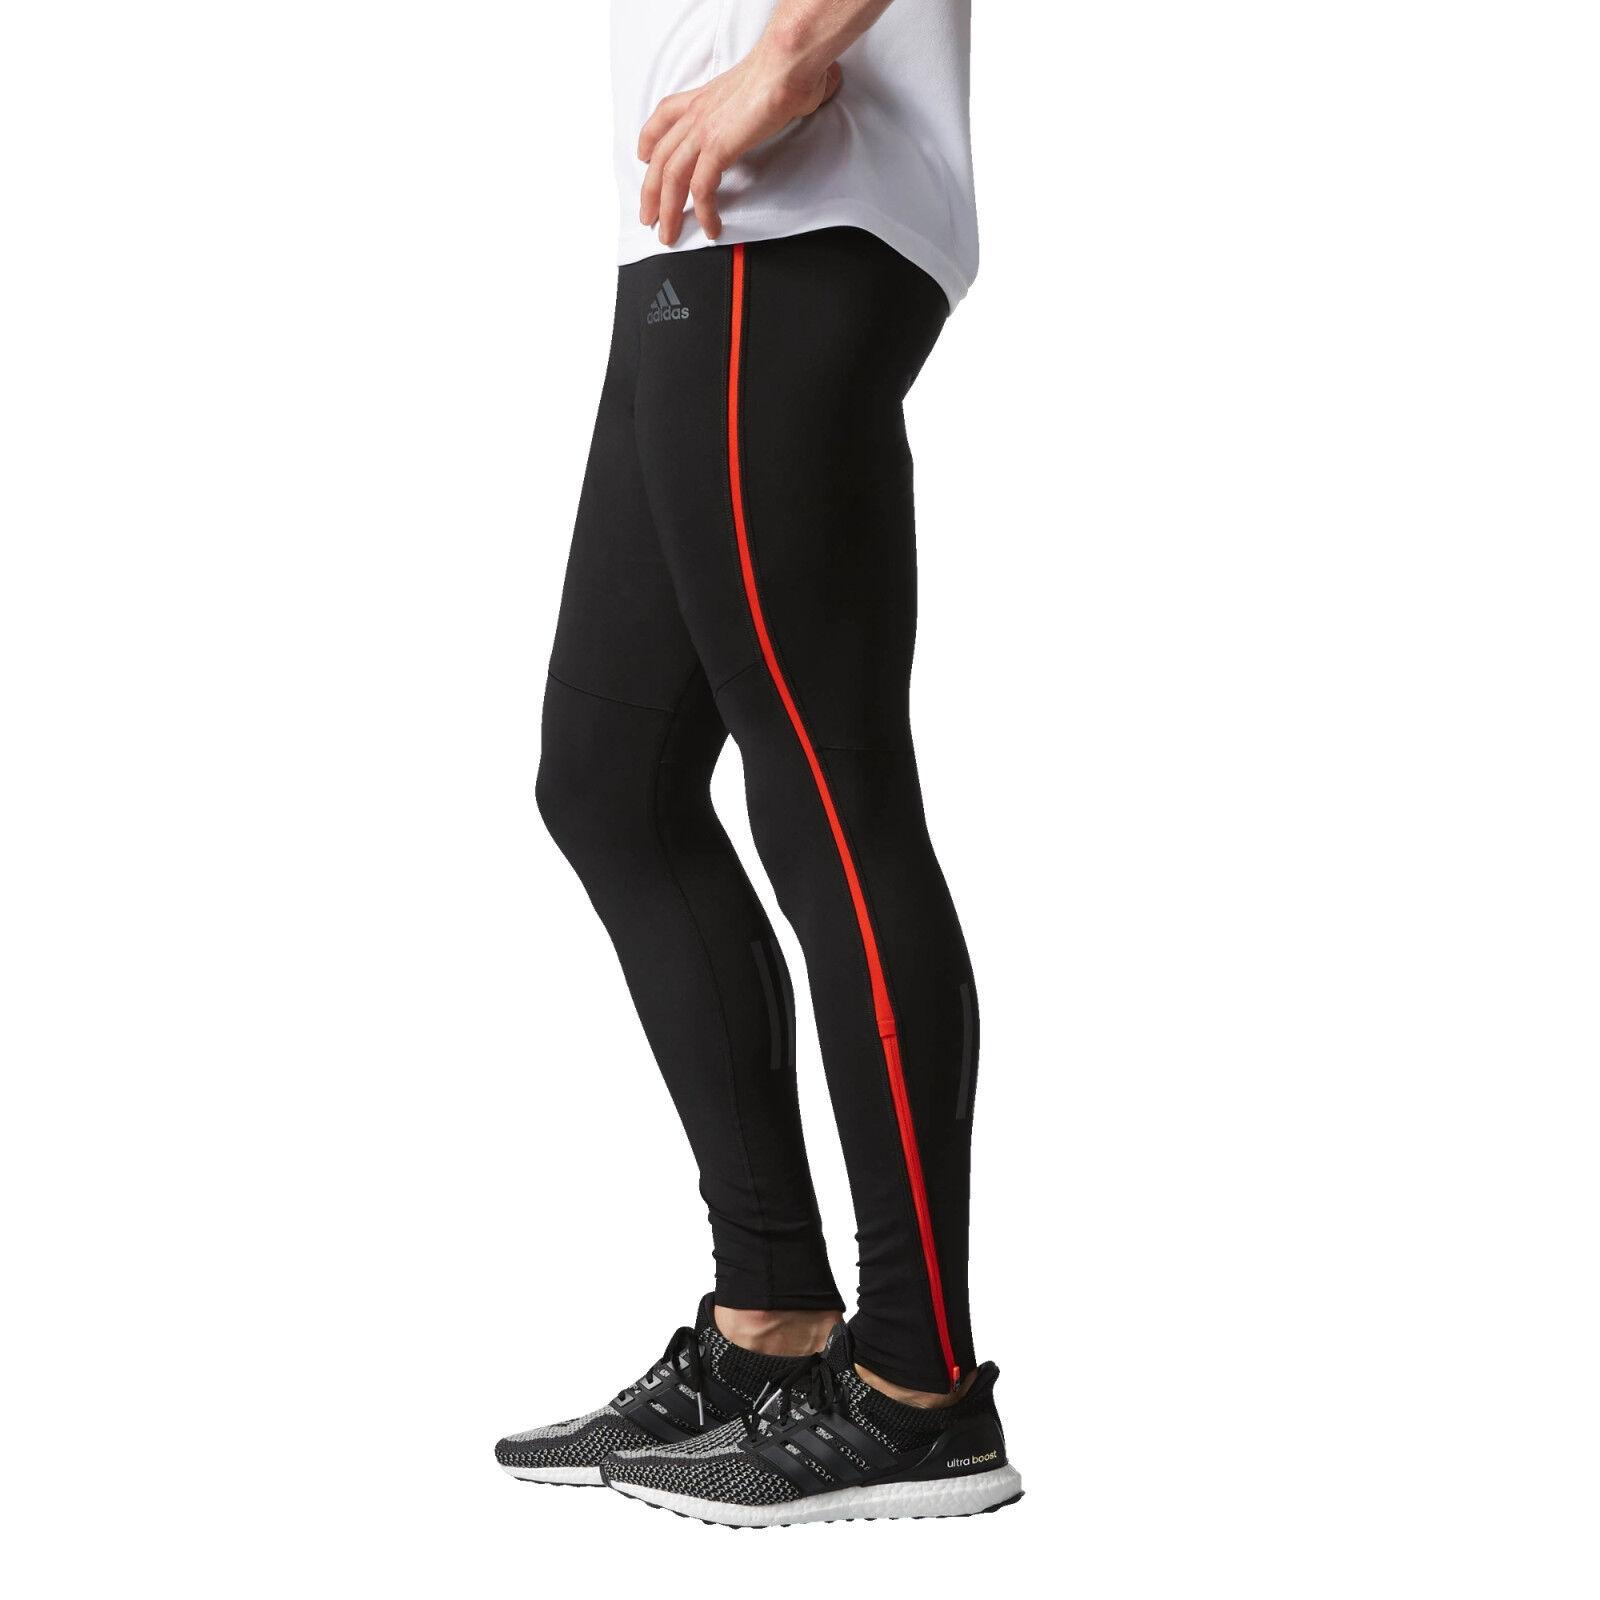 Adidas Herren Strumpfhosen Laufen Gamaschen Response Lang Training